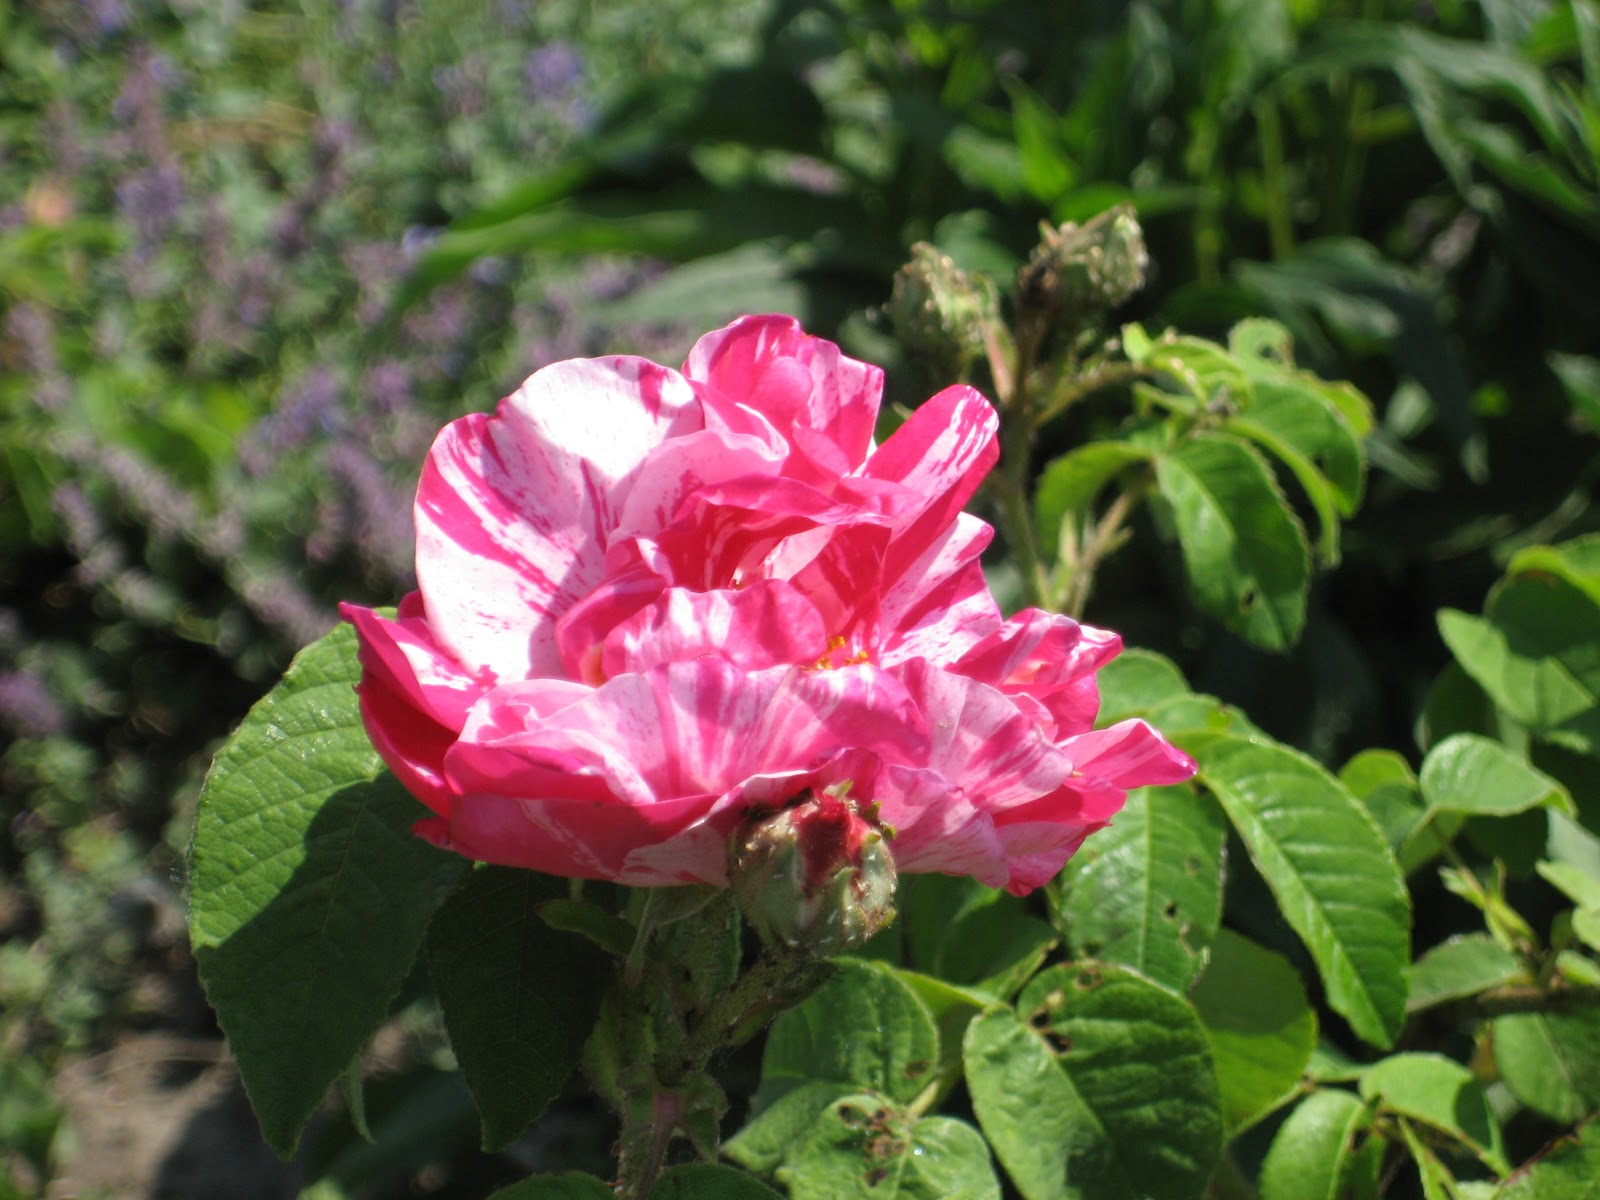 Rosa gallica versicolor (Rosa Mundi) | Old roses in my garden